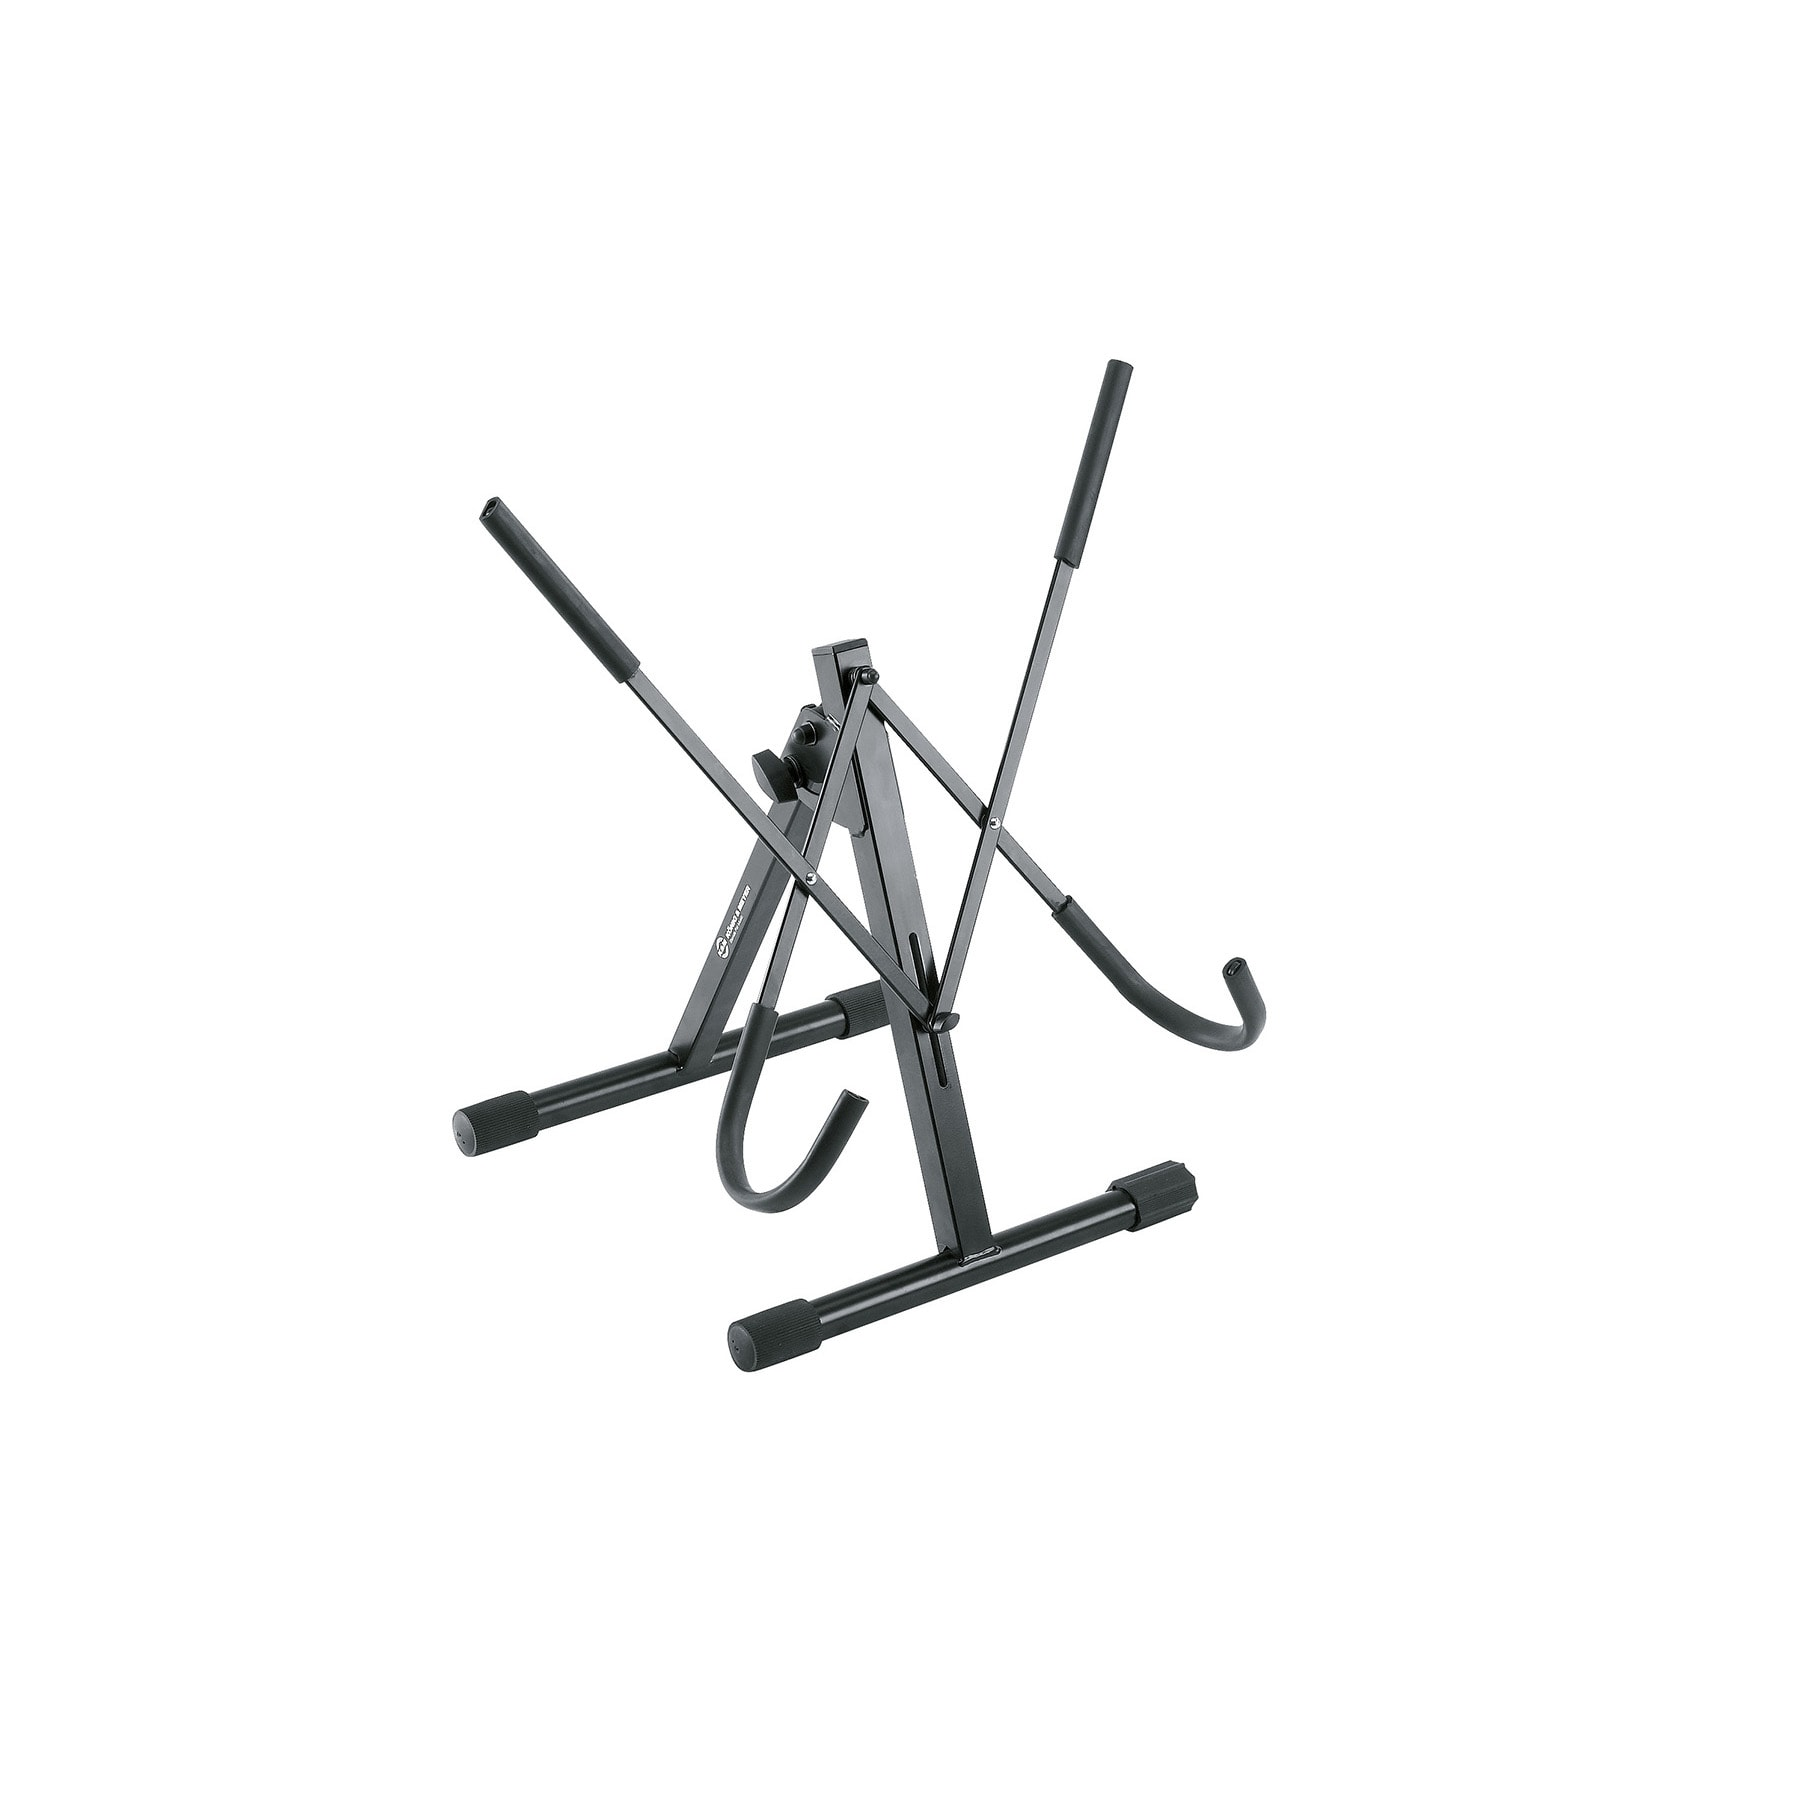 KM14930 - Sousaphone stand